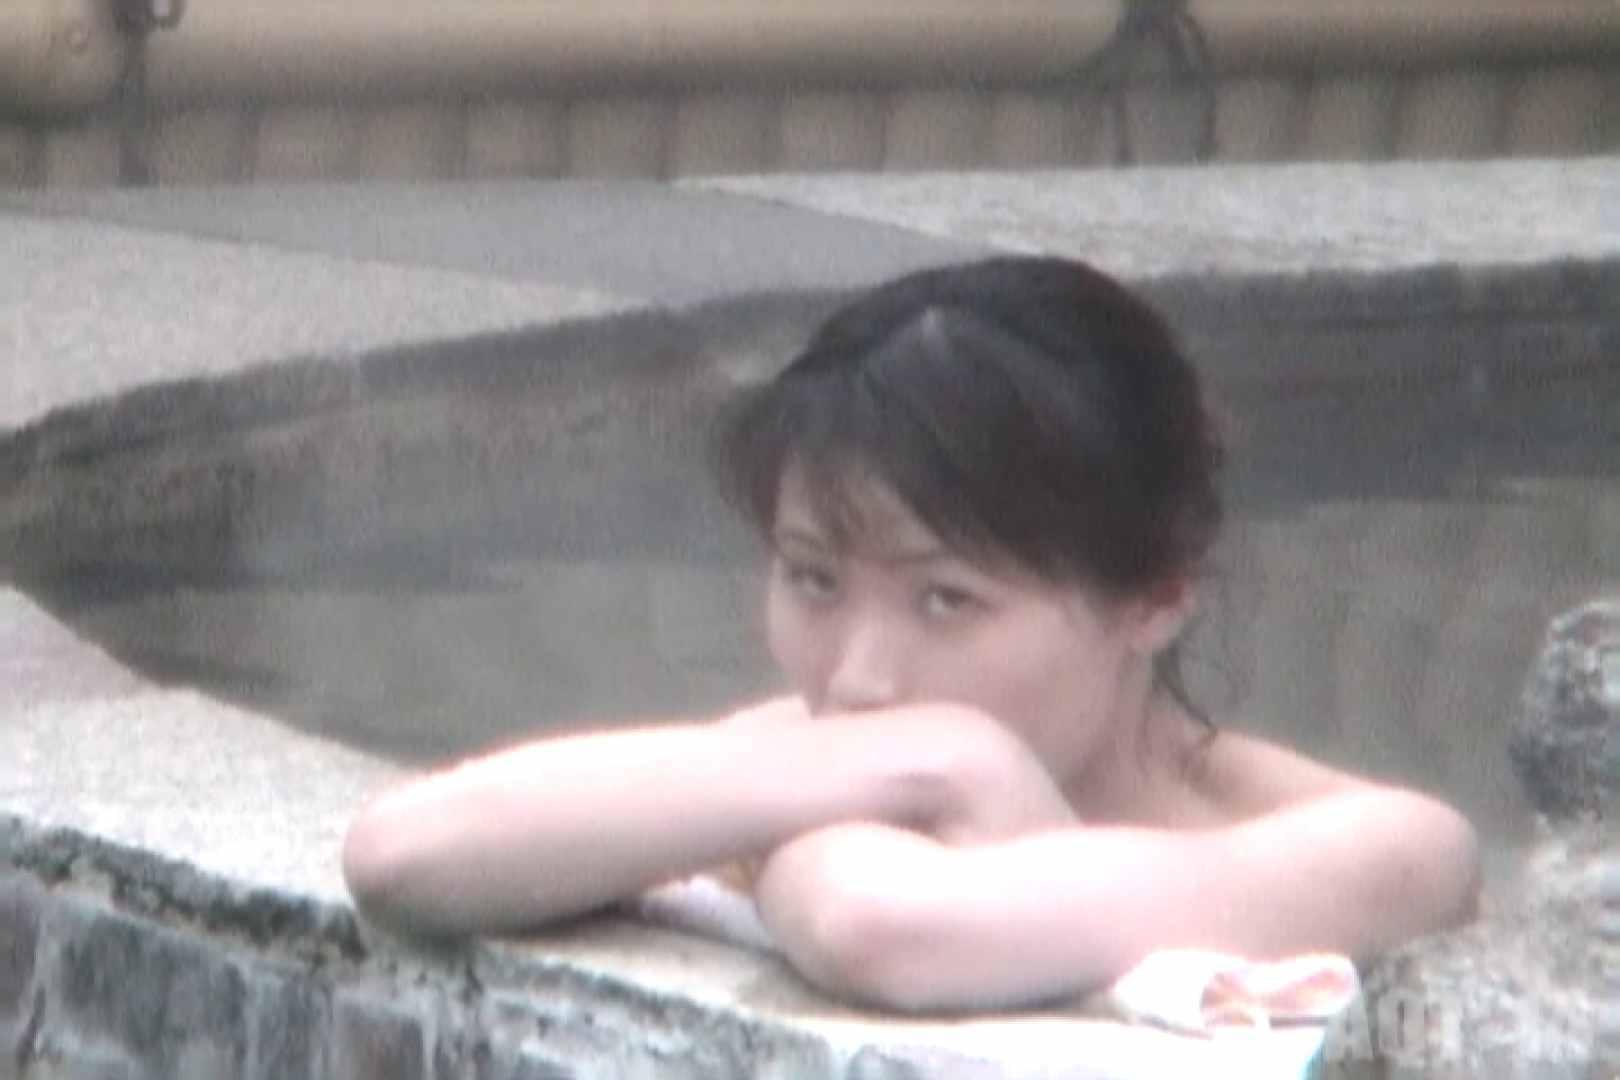 Aquaな露天風呂Vol.822 盗撮 オメコ無修正動画無料 62連発 17